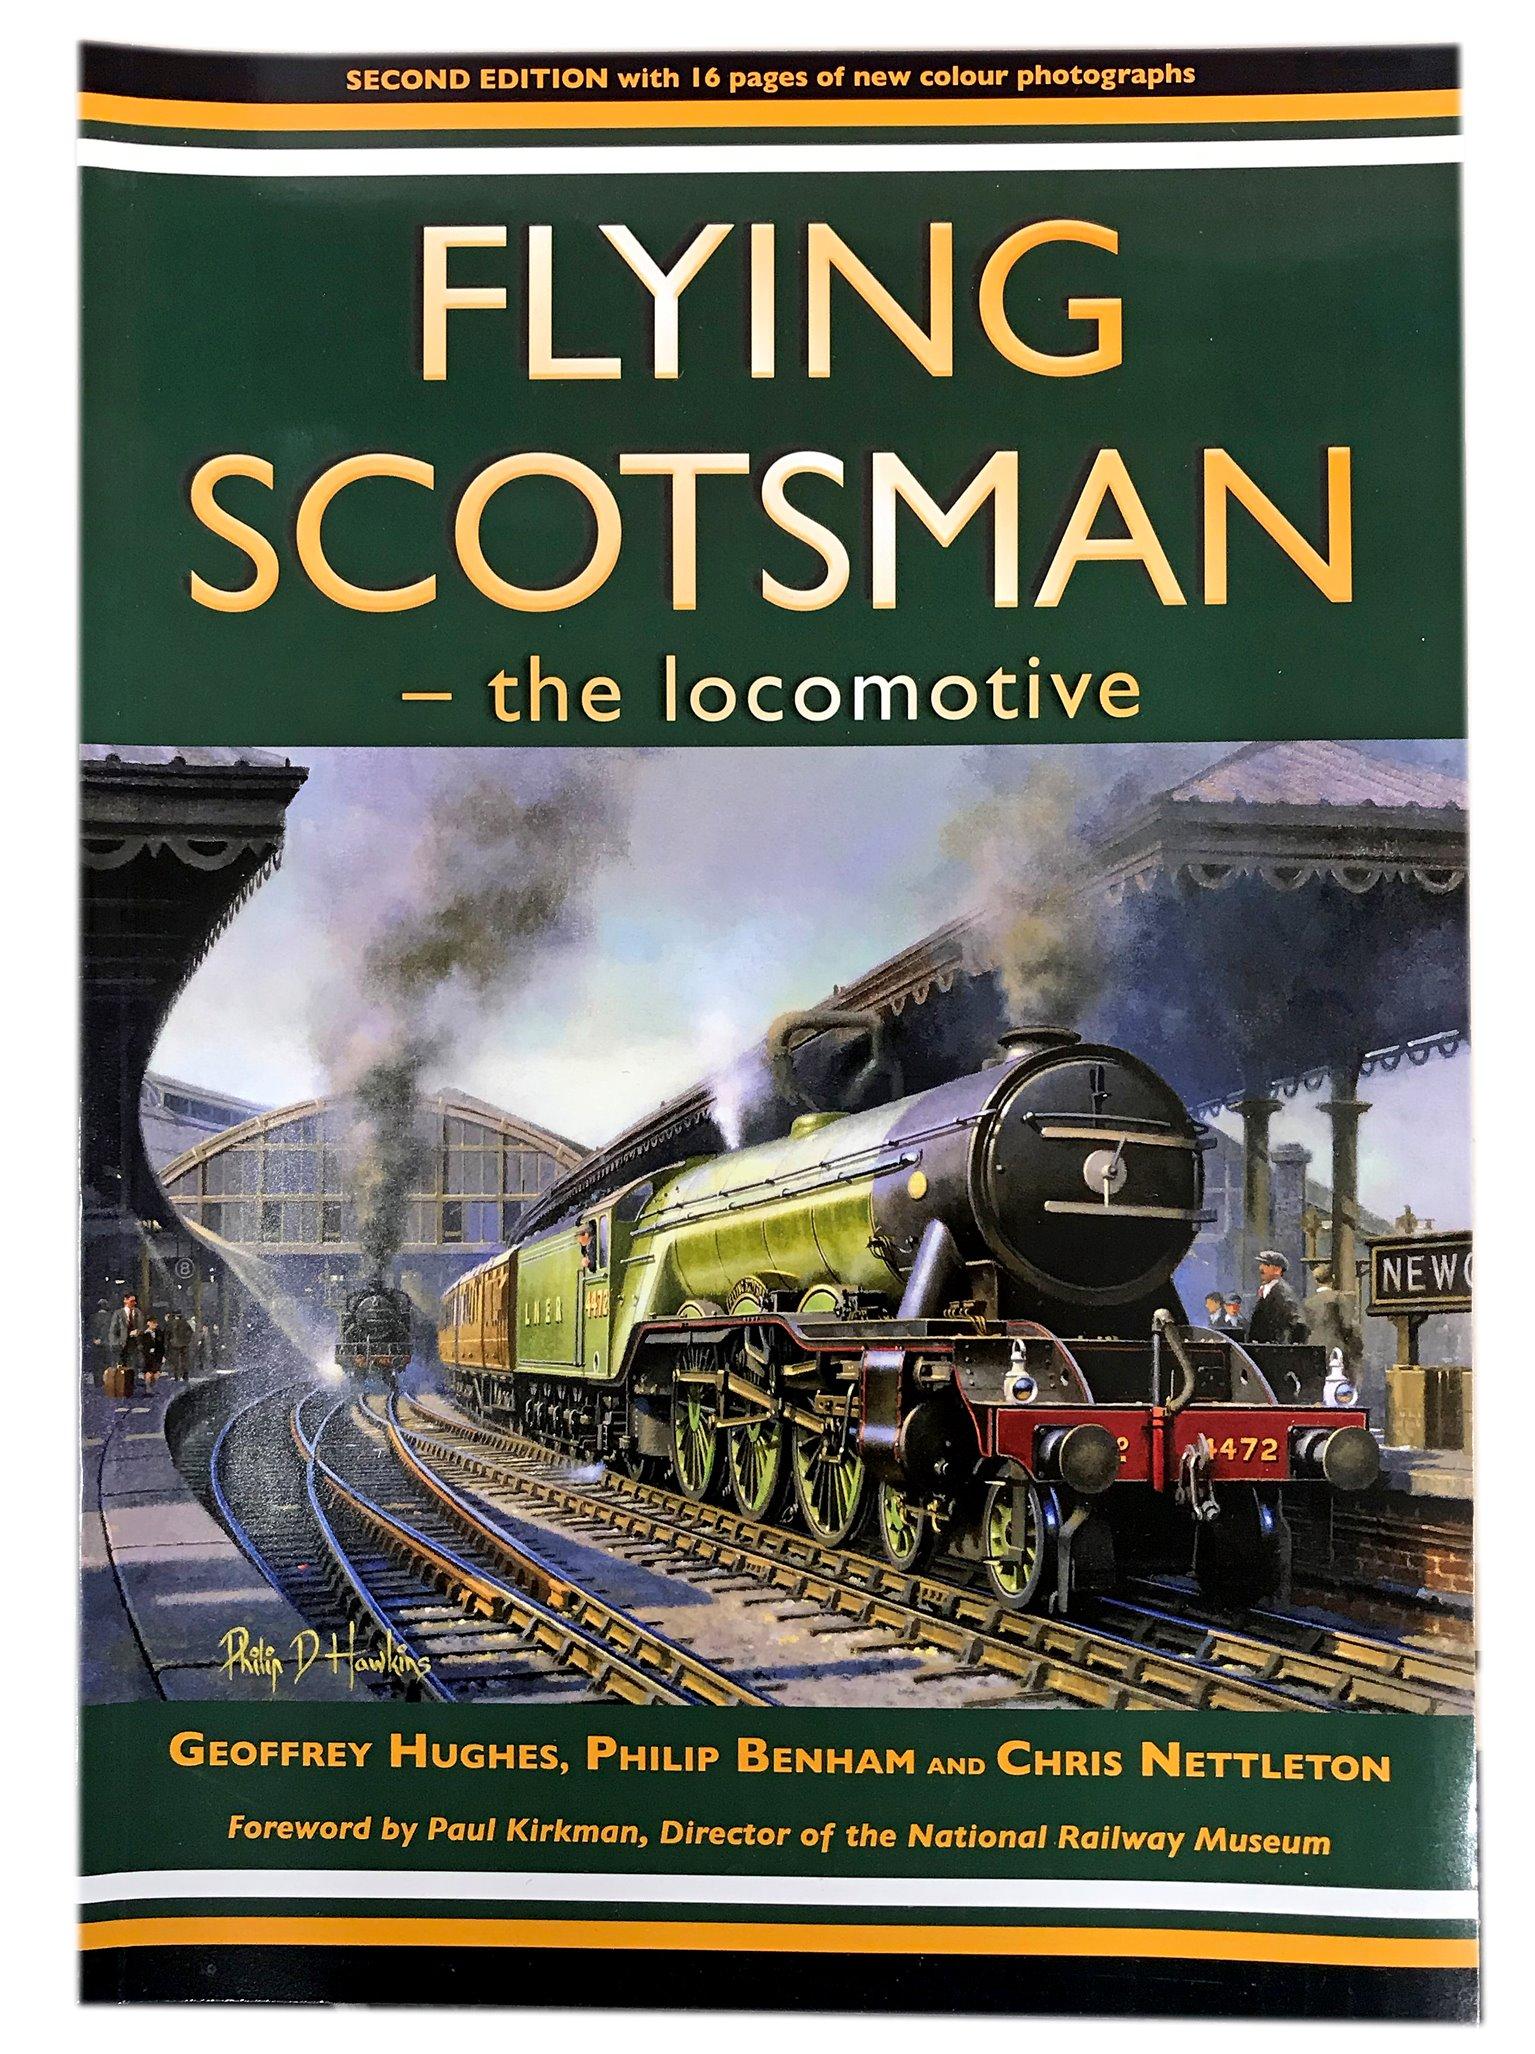 FLYING SCOTSMAN - the locomotive